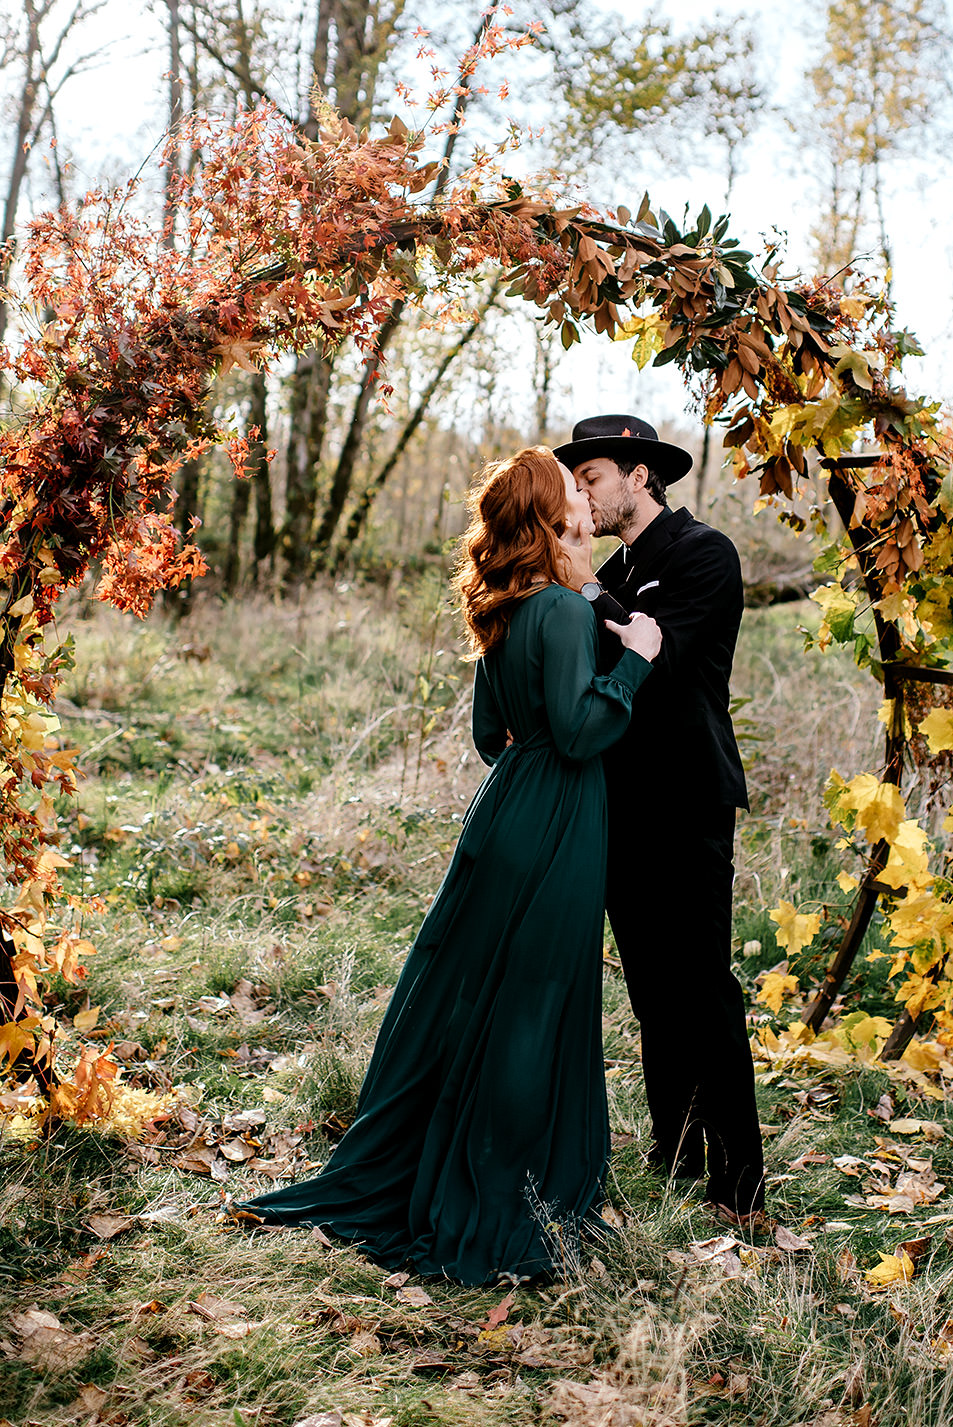 Portland-elopement-photographer-Autunm-wedding-inspiration-14.jpg